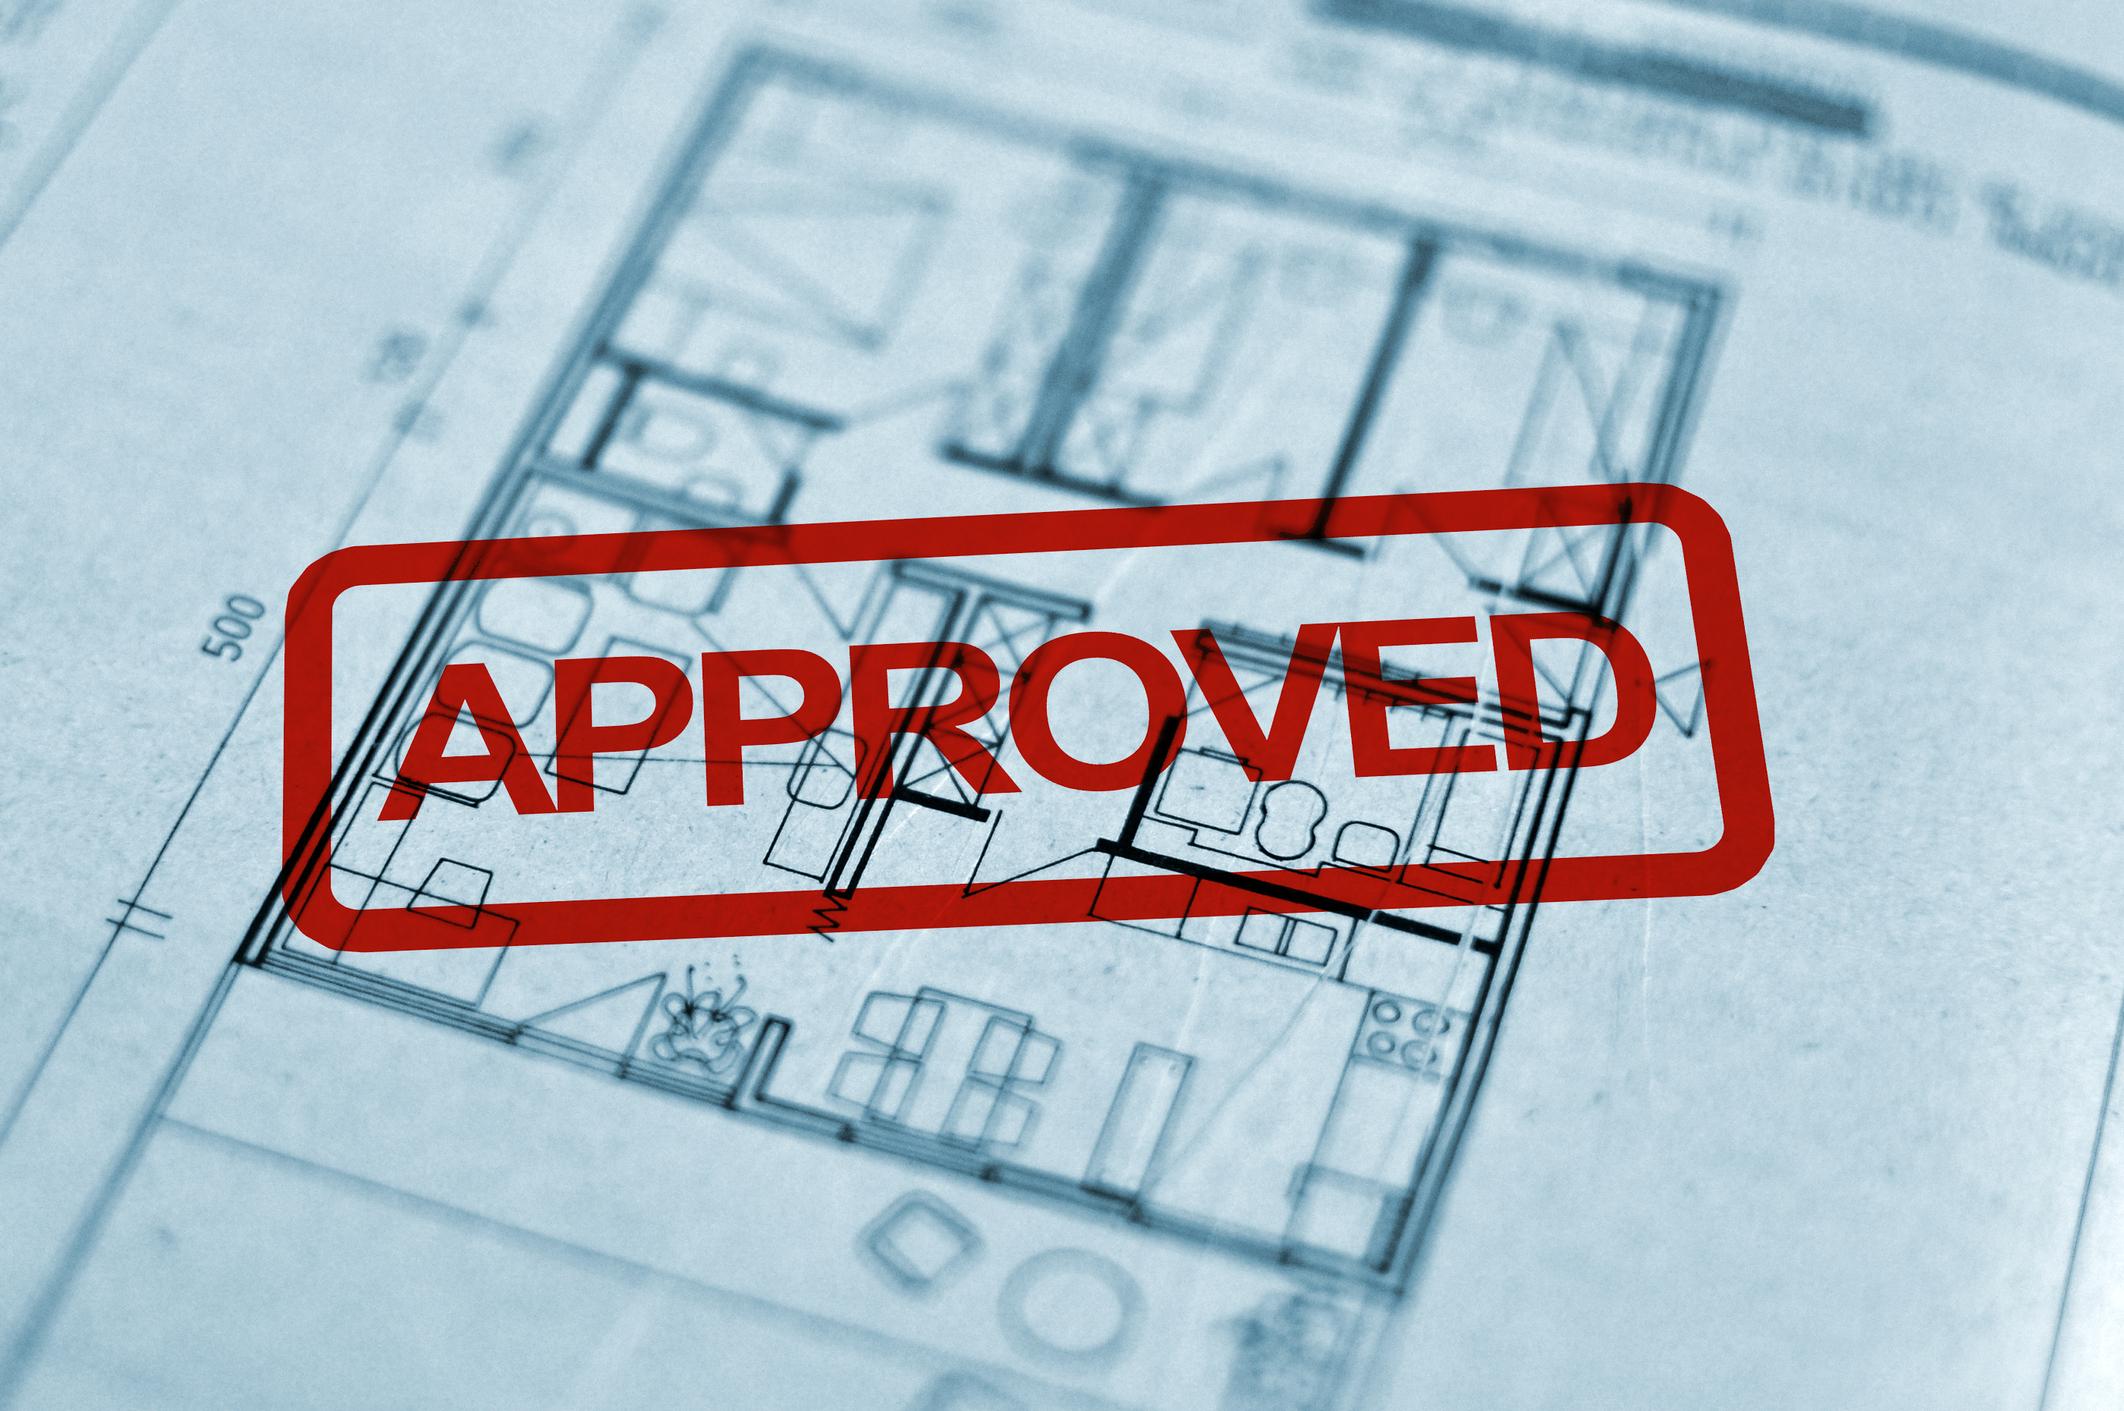 planningpermission planning permission for a new house house plans,Planning Permission For New House